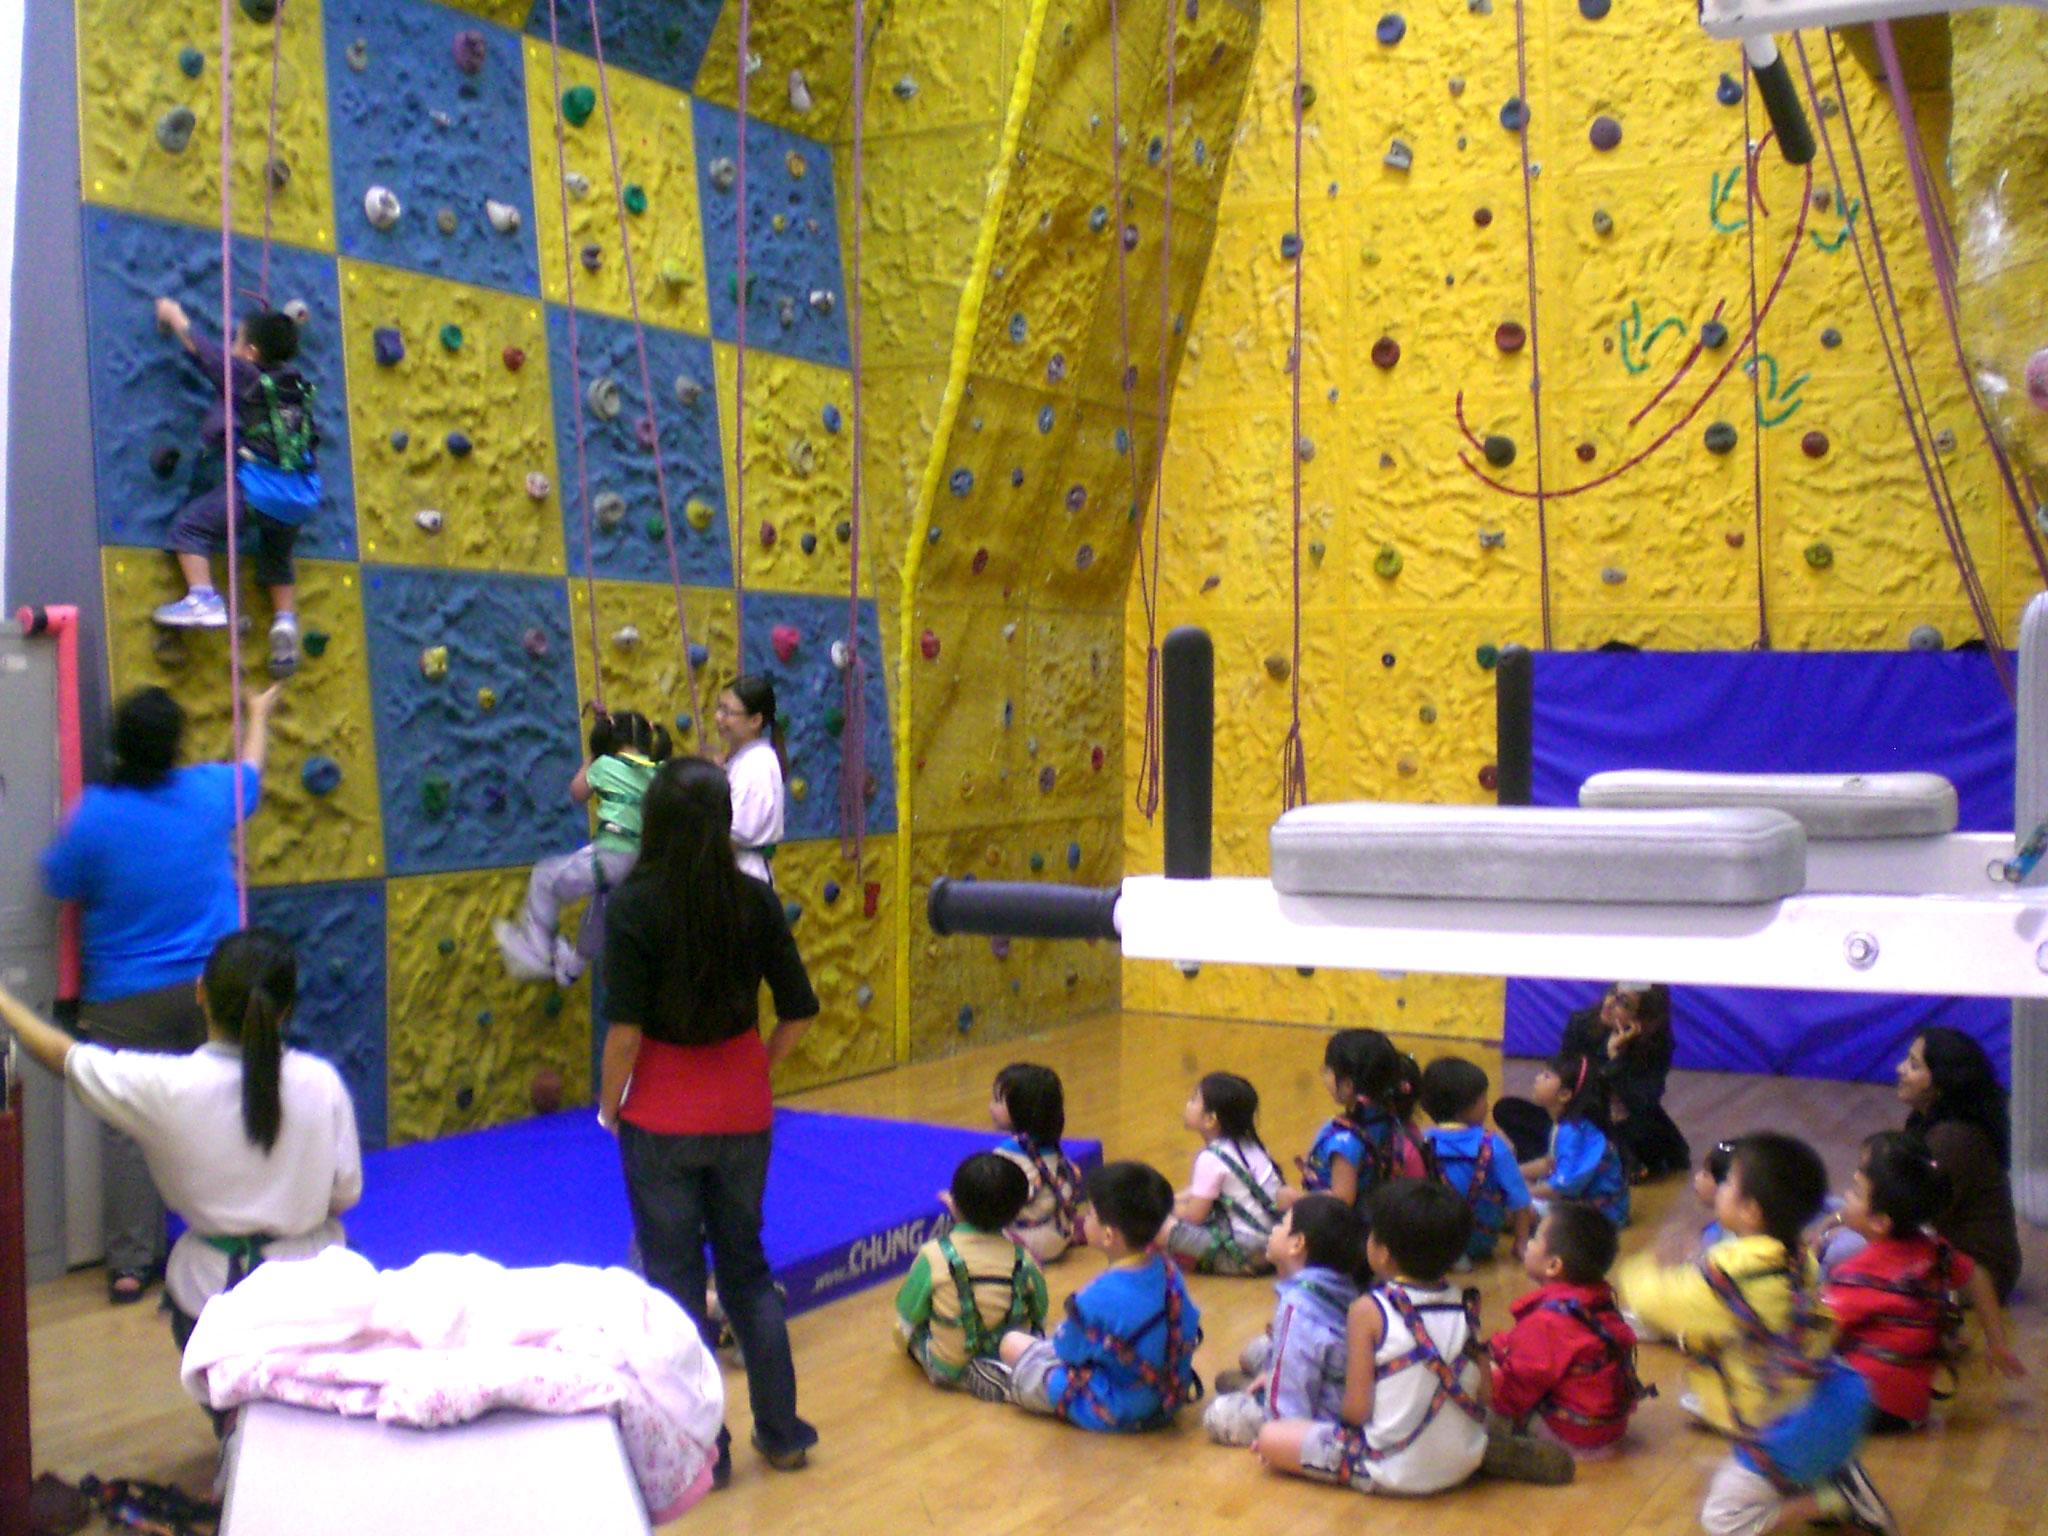 File:HK YMCA TST Club Sport Climbing Wall 4 Children 3 a.jpg ...